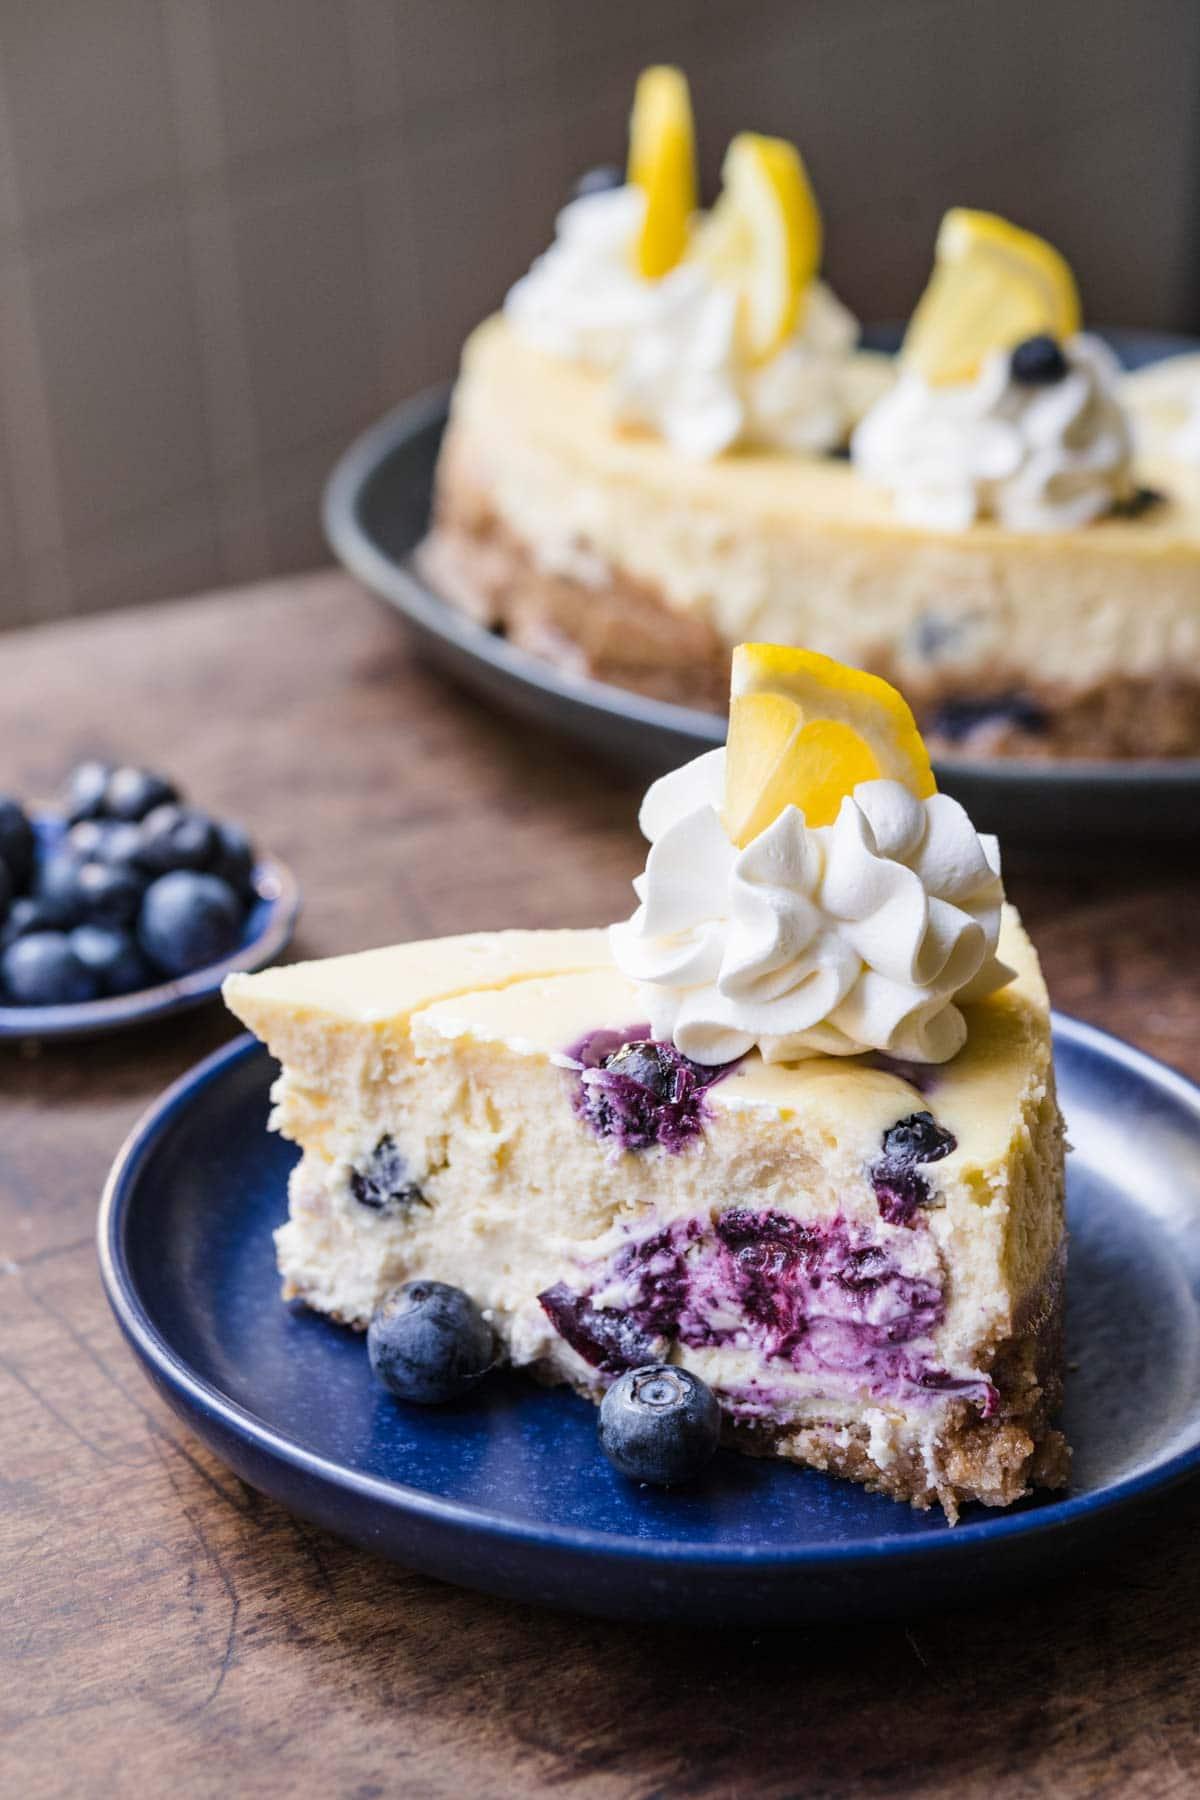 Blueberry Lemon Cheesecake slice on plate with whipped cream, fresh blueberries and lemon garnish